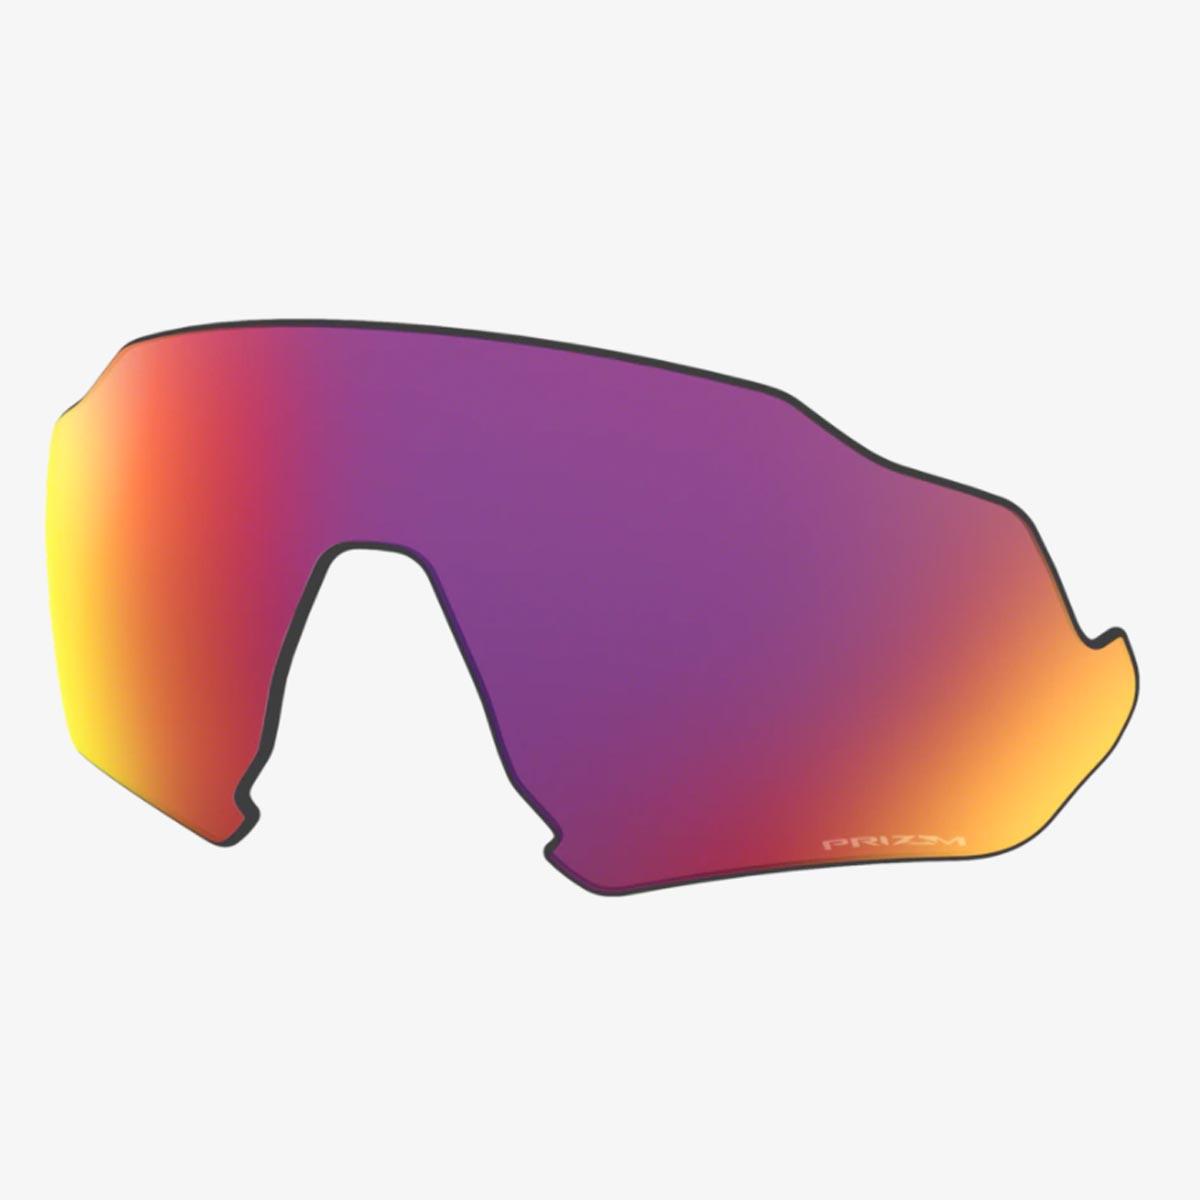 Lente Extra Para Oculos Oakley Flight Jacket Prizm Road Espelhada Vermelha